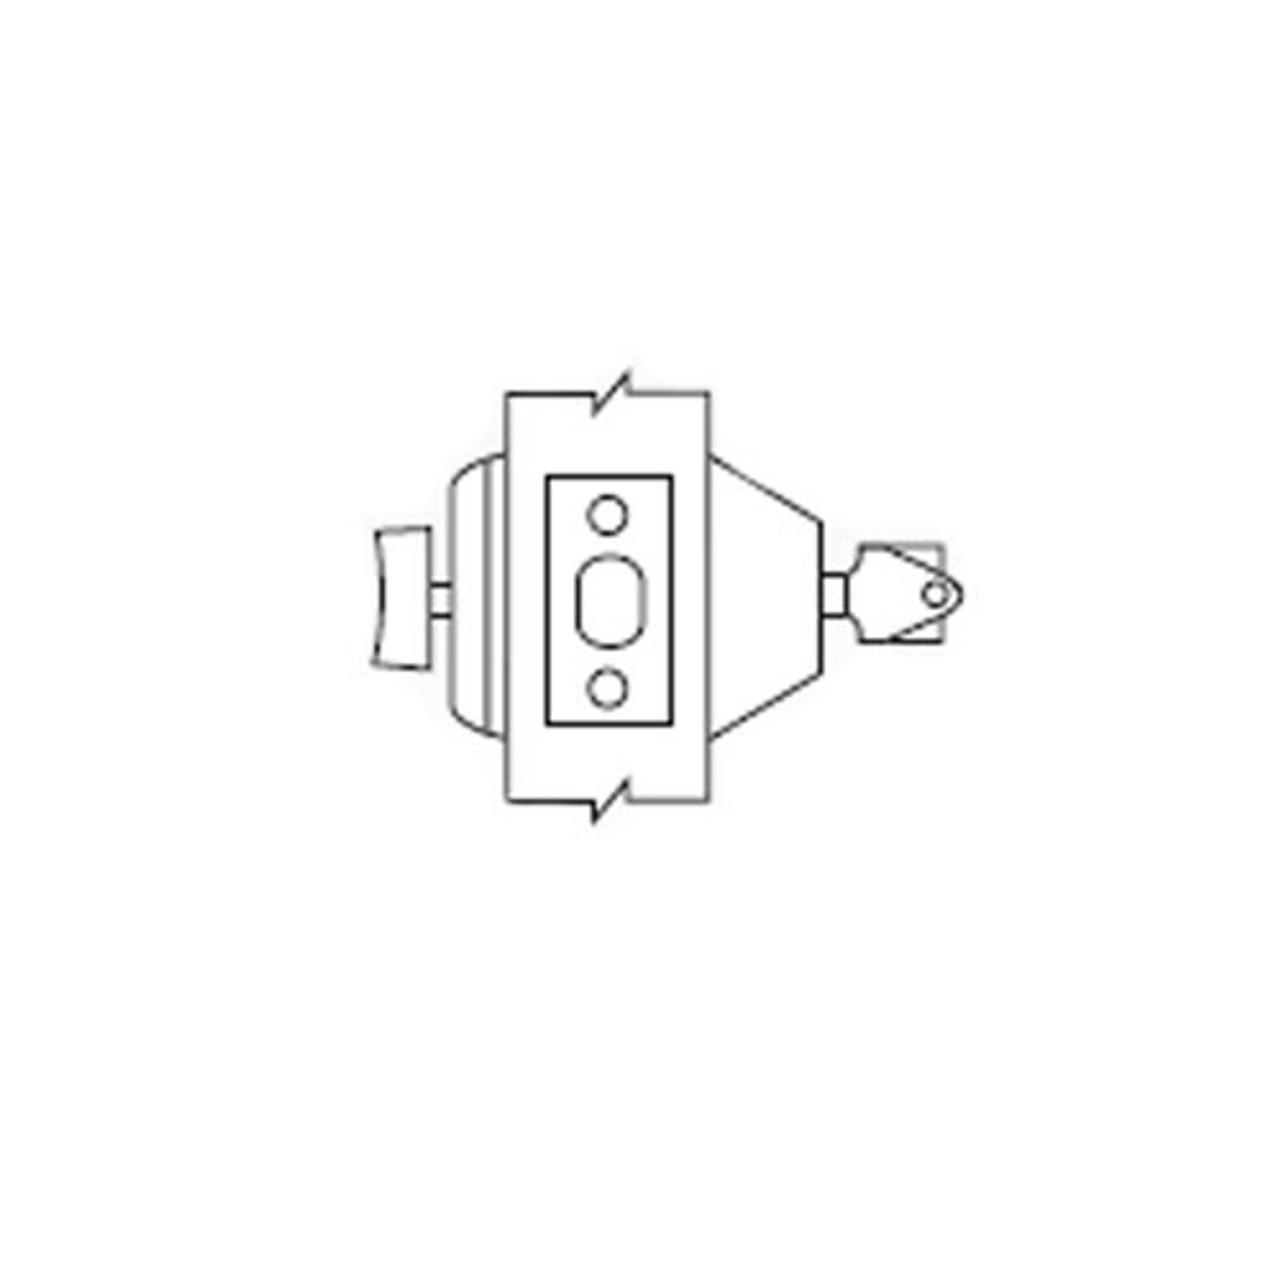 d61-10b arrow lock d series deadbolt single cylinder with ... diagram lock thumbturn  lock depot